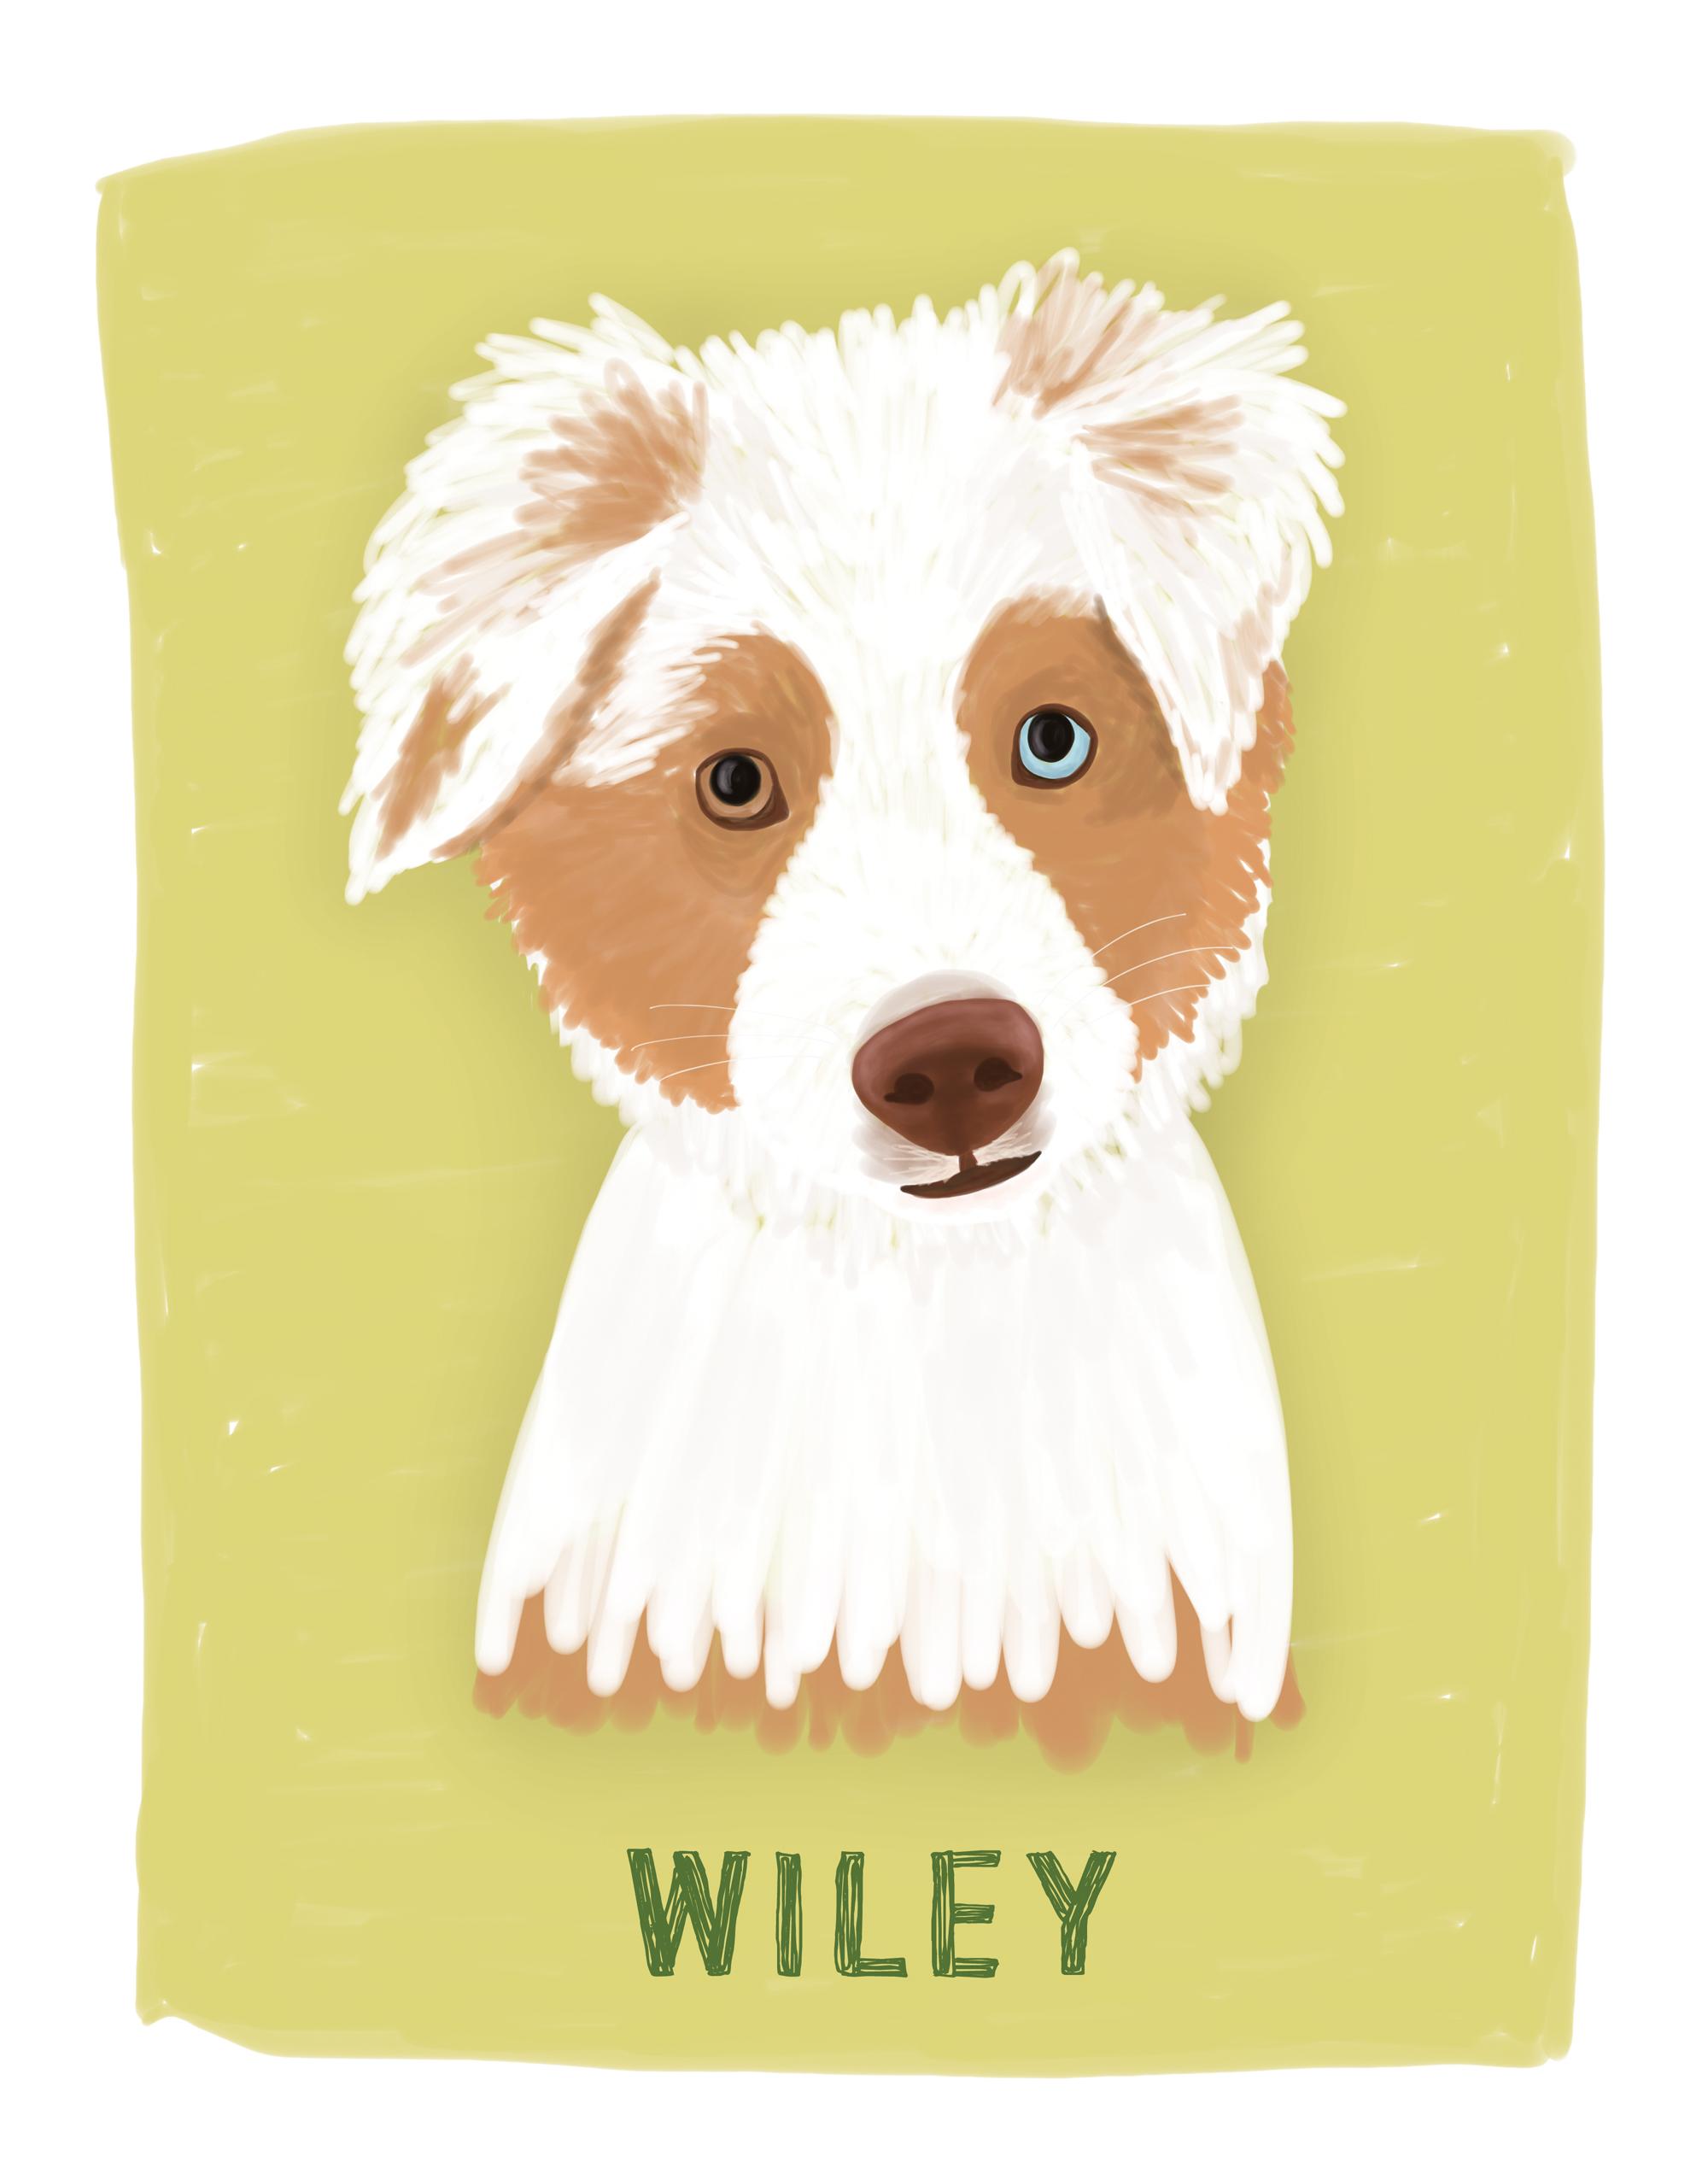 Wiley-Dog-Portrait.jpg